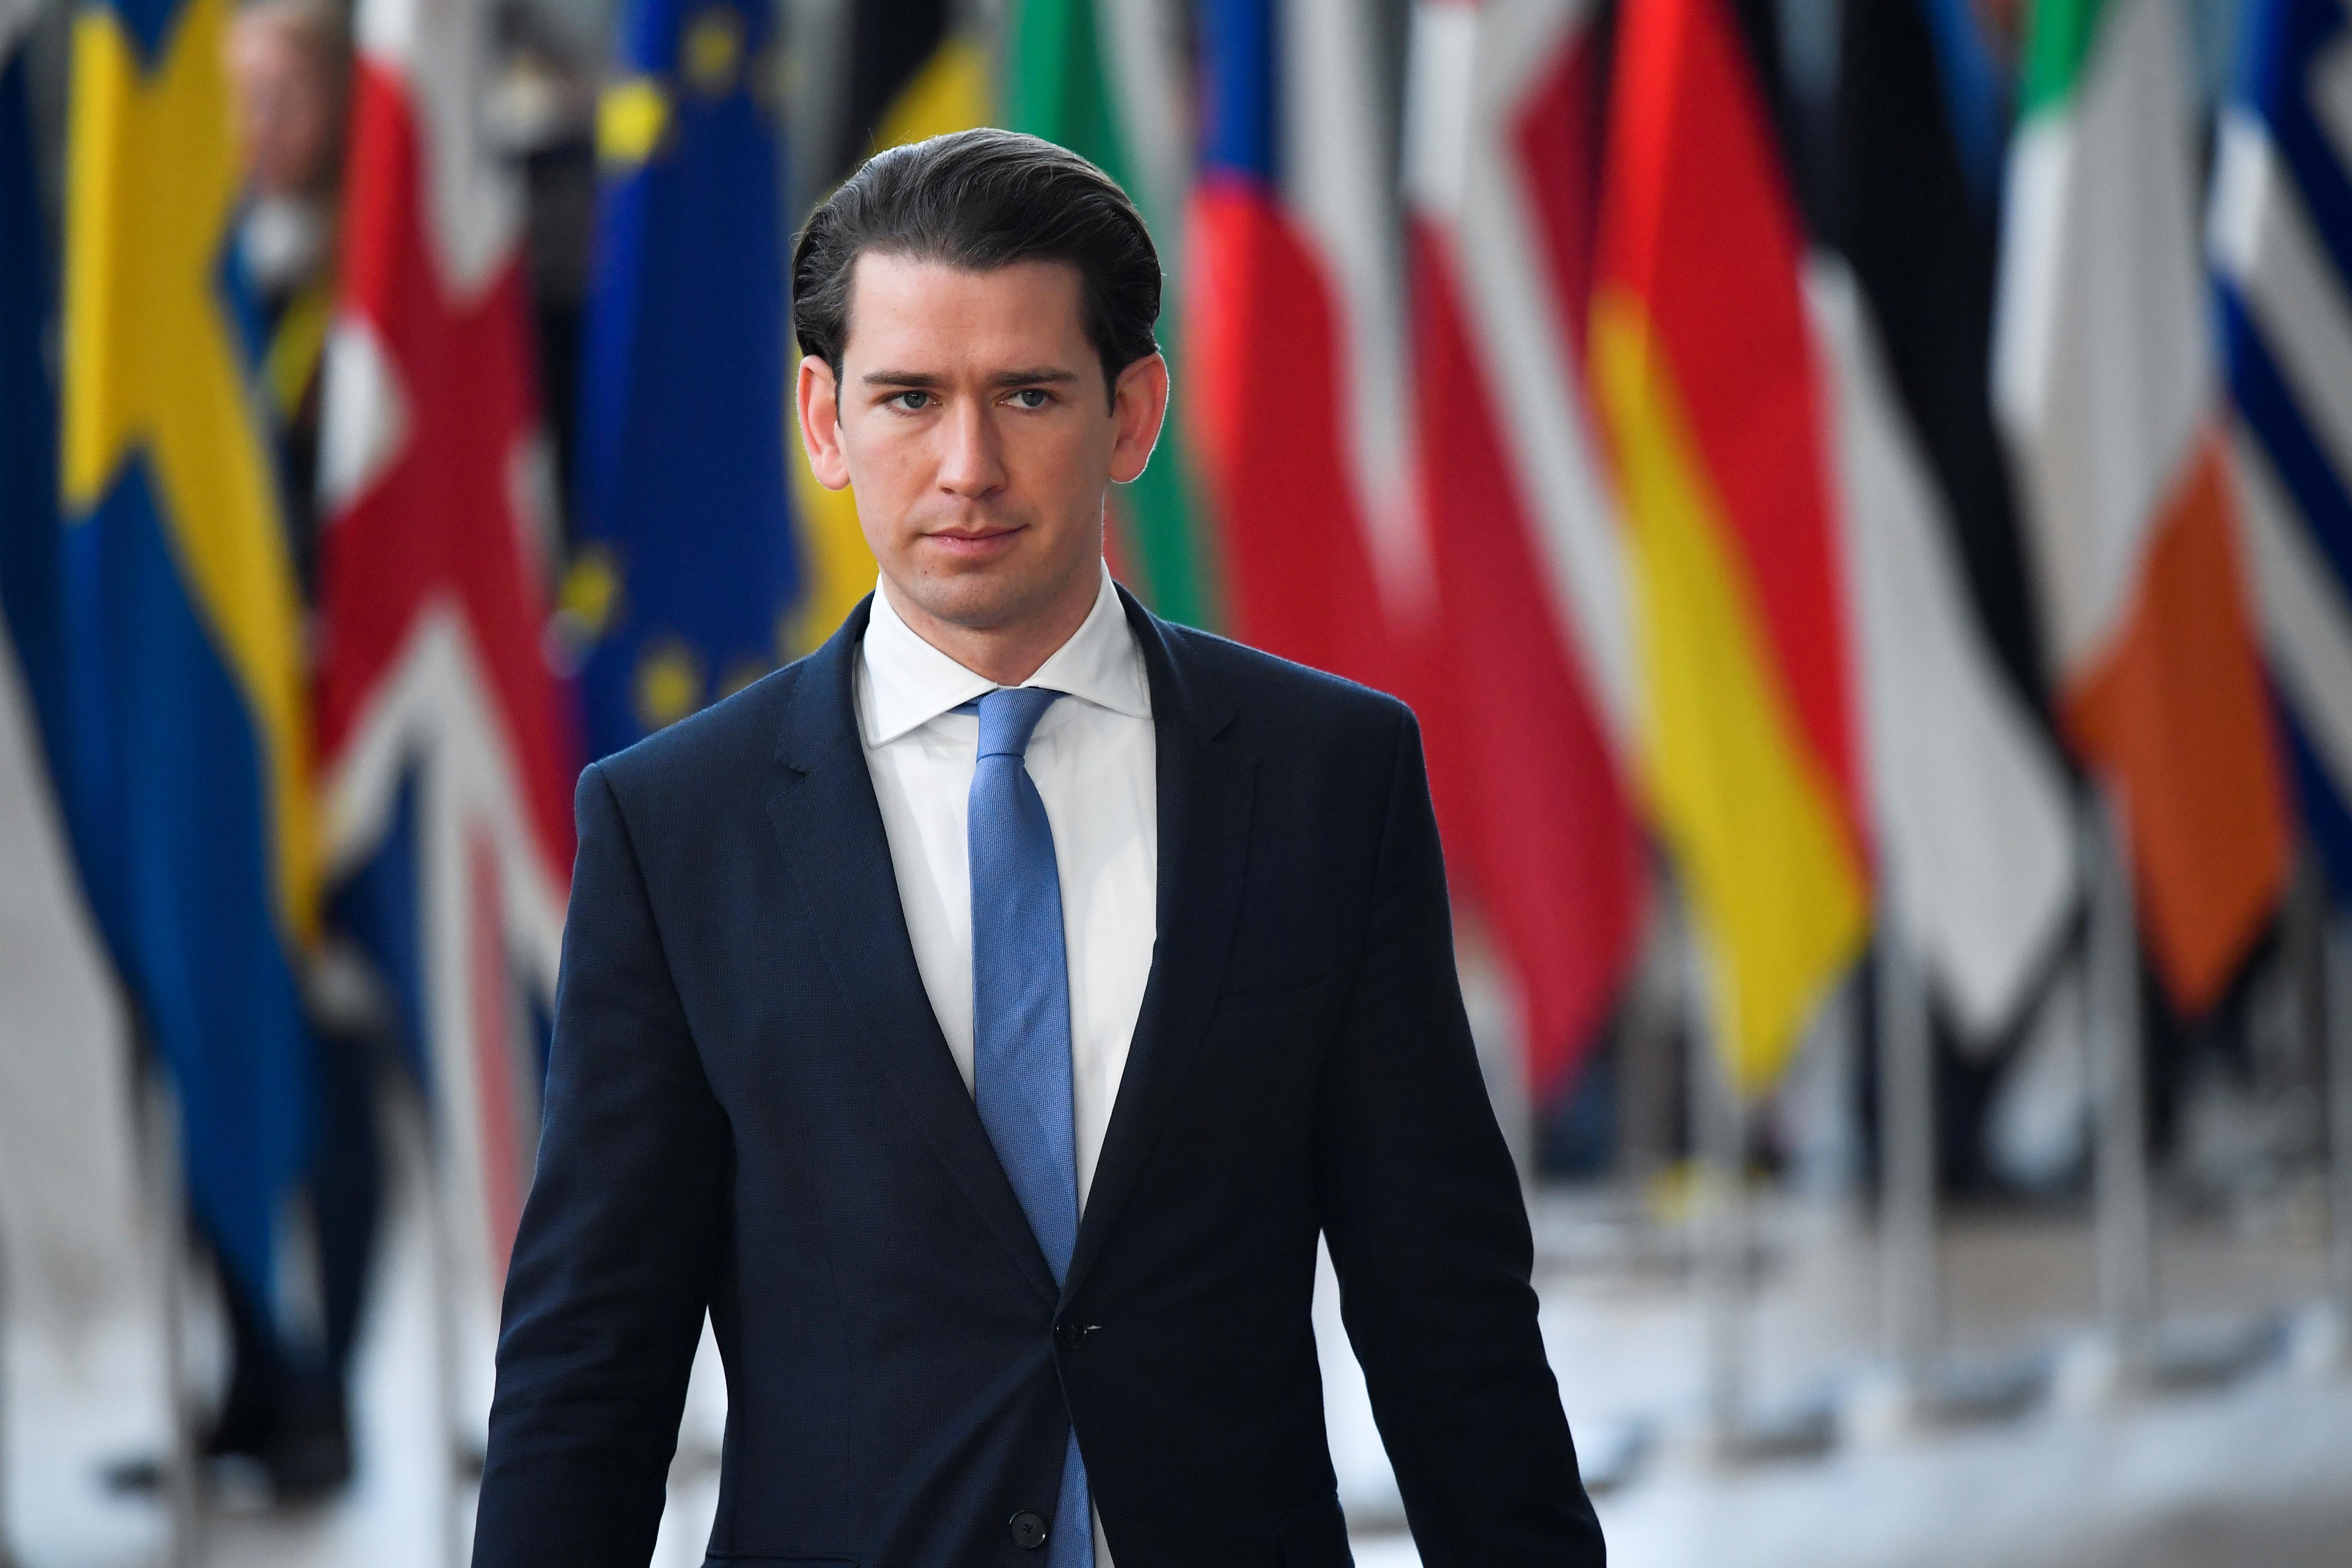 Exhausting Brexit will happen if no new British concept - Austria's Kurz